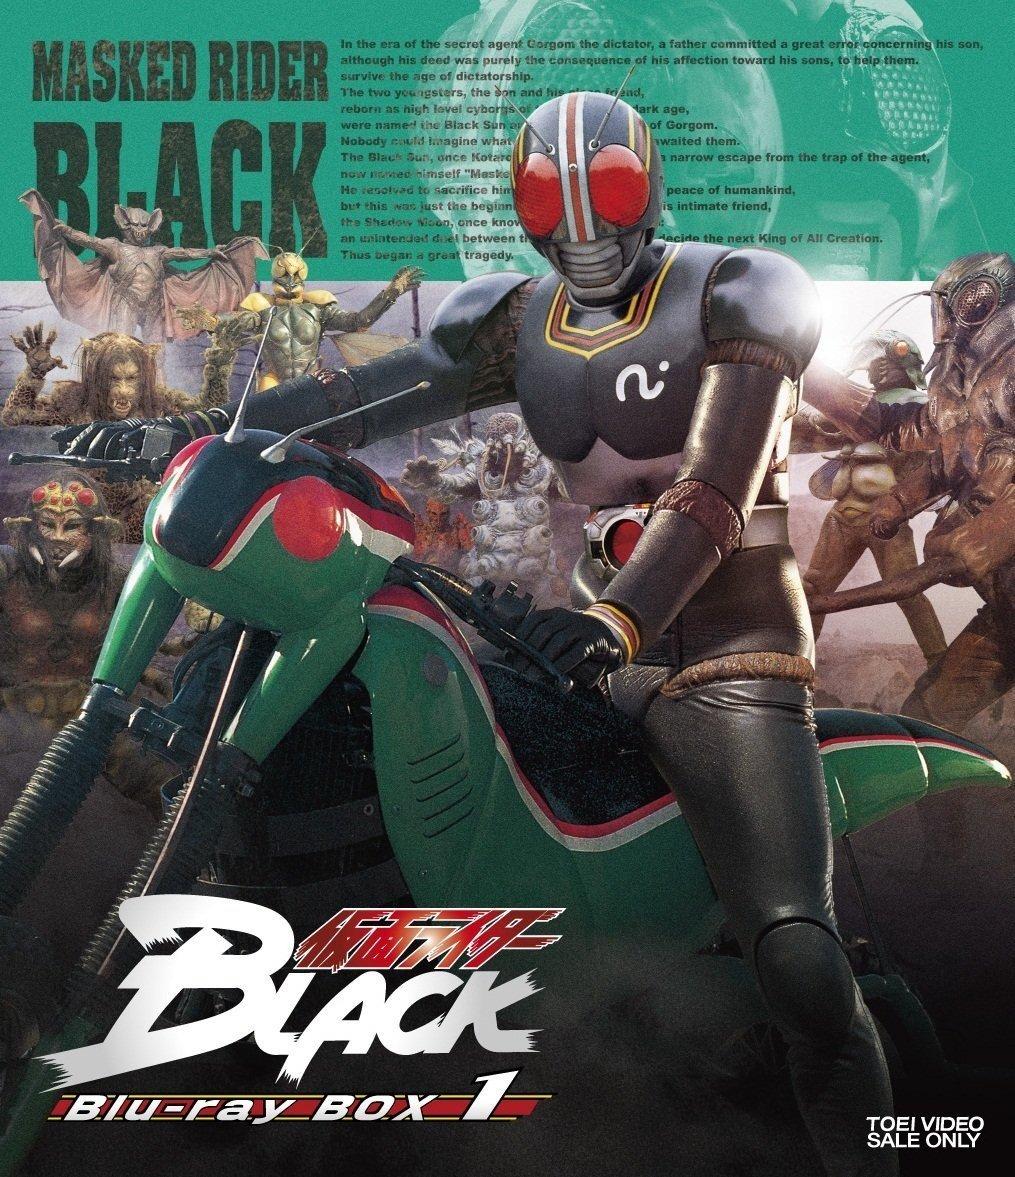 Shanibudirumahaja On Twitter Tahun Ini Kan Ulang Tahun Ke 30 Nya Kamen Rider Black Atau Yg Di Sini Dikenal Dengan Nama Ksatria Baja Hitam Ya Apa Yang Paling Lo Inget Dari Serial Ini